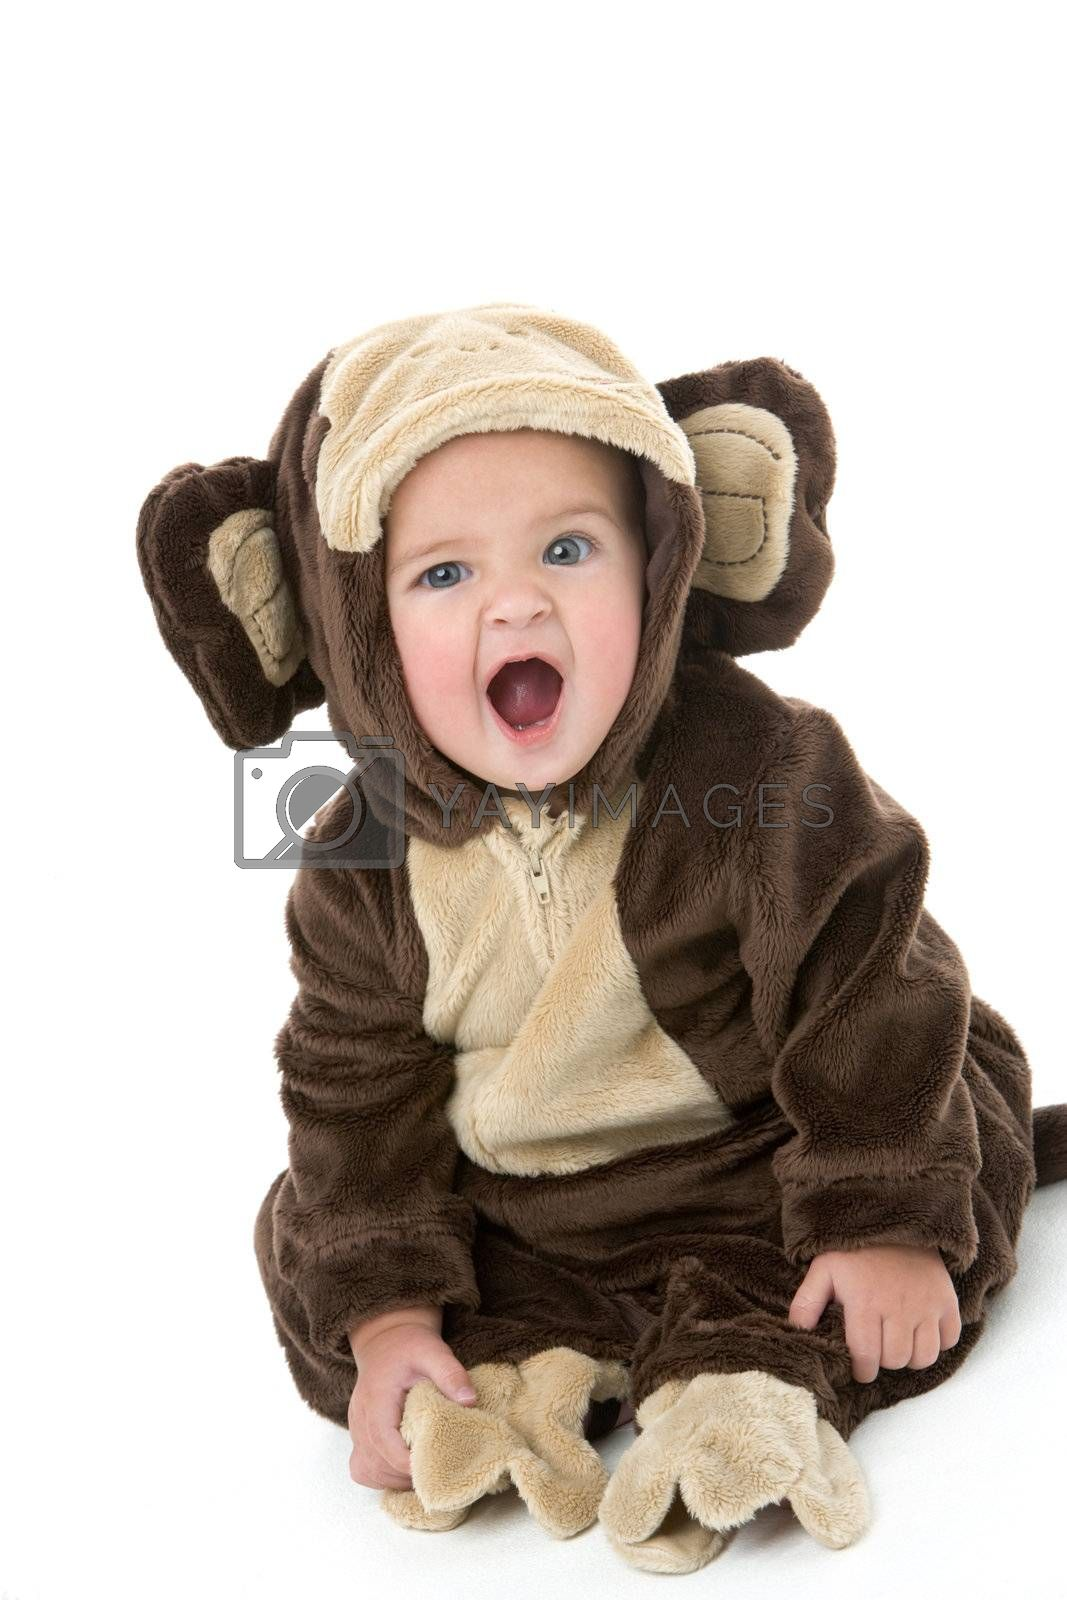 Baby in monkey costume